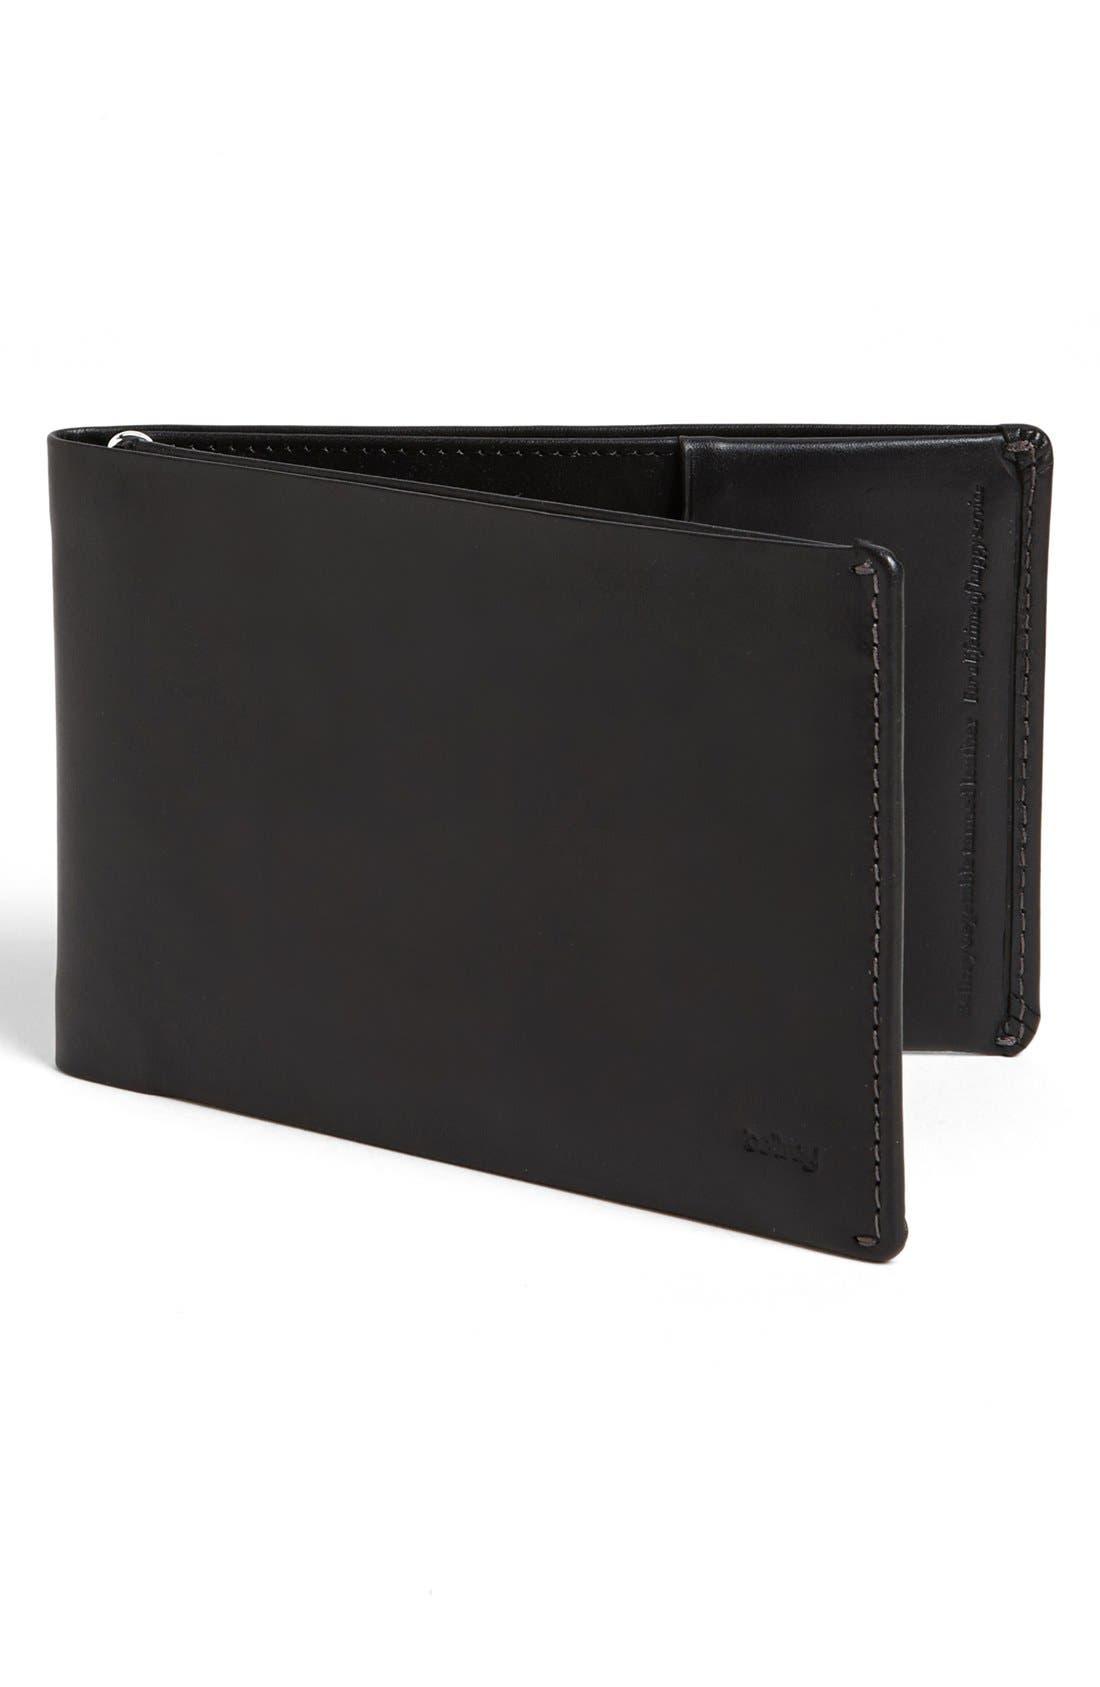 Alternate Image 1 Selected - Bellroy Travel Wallet